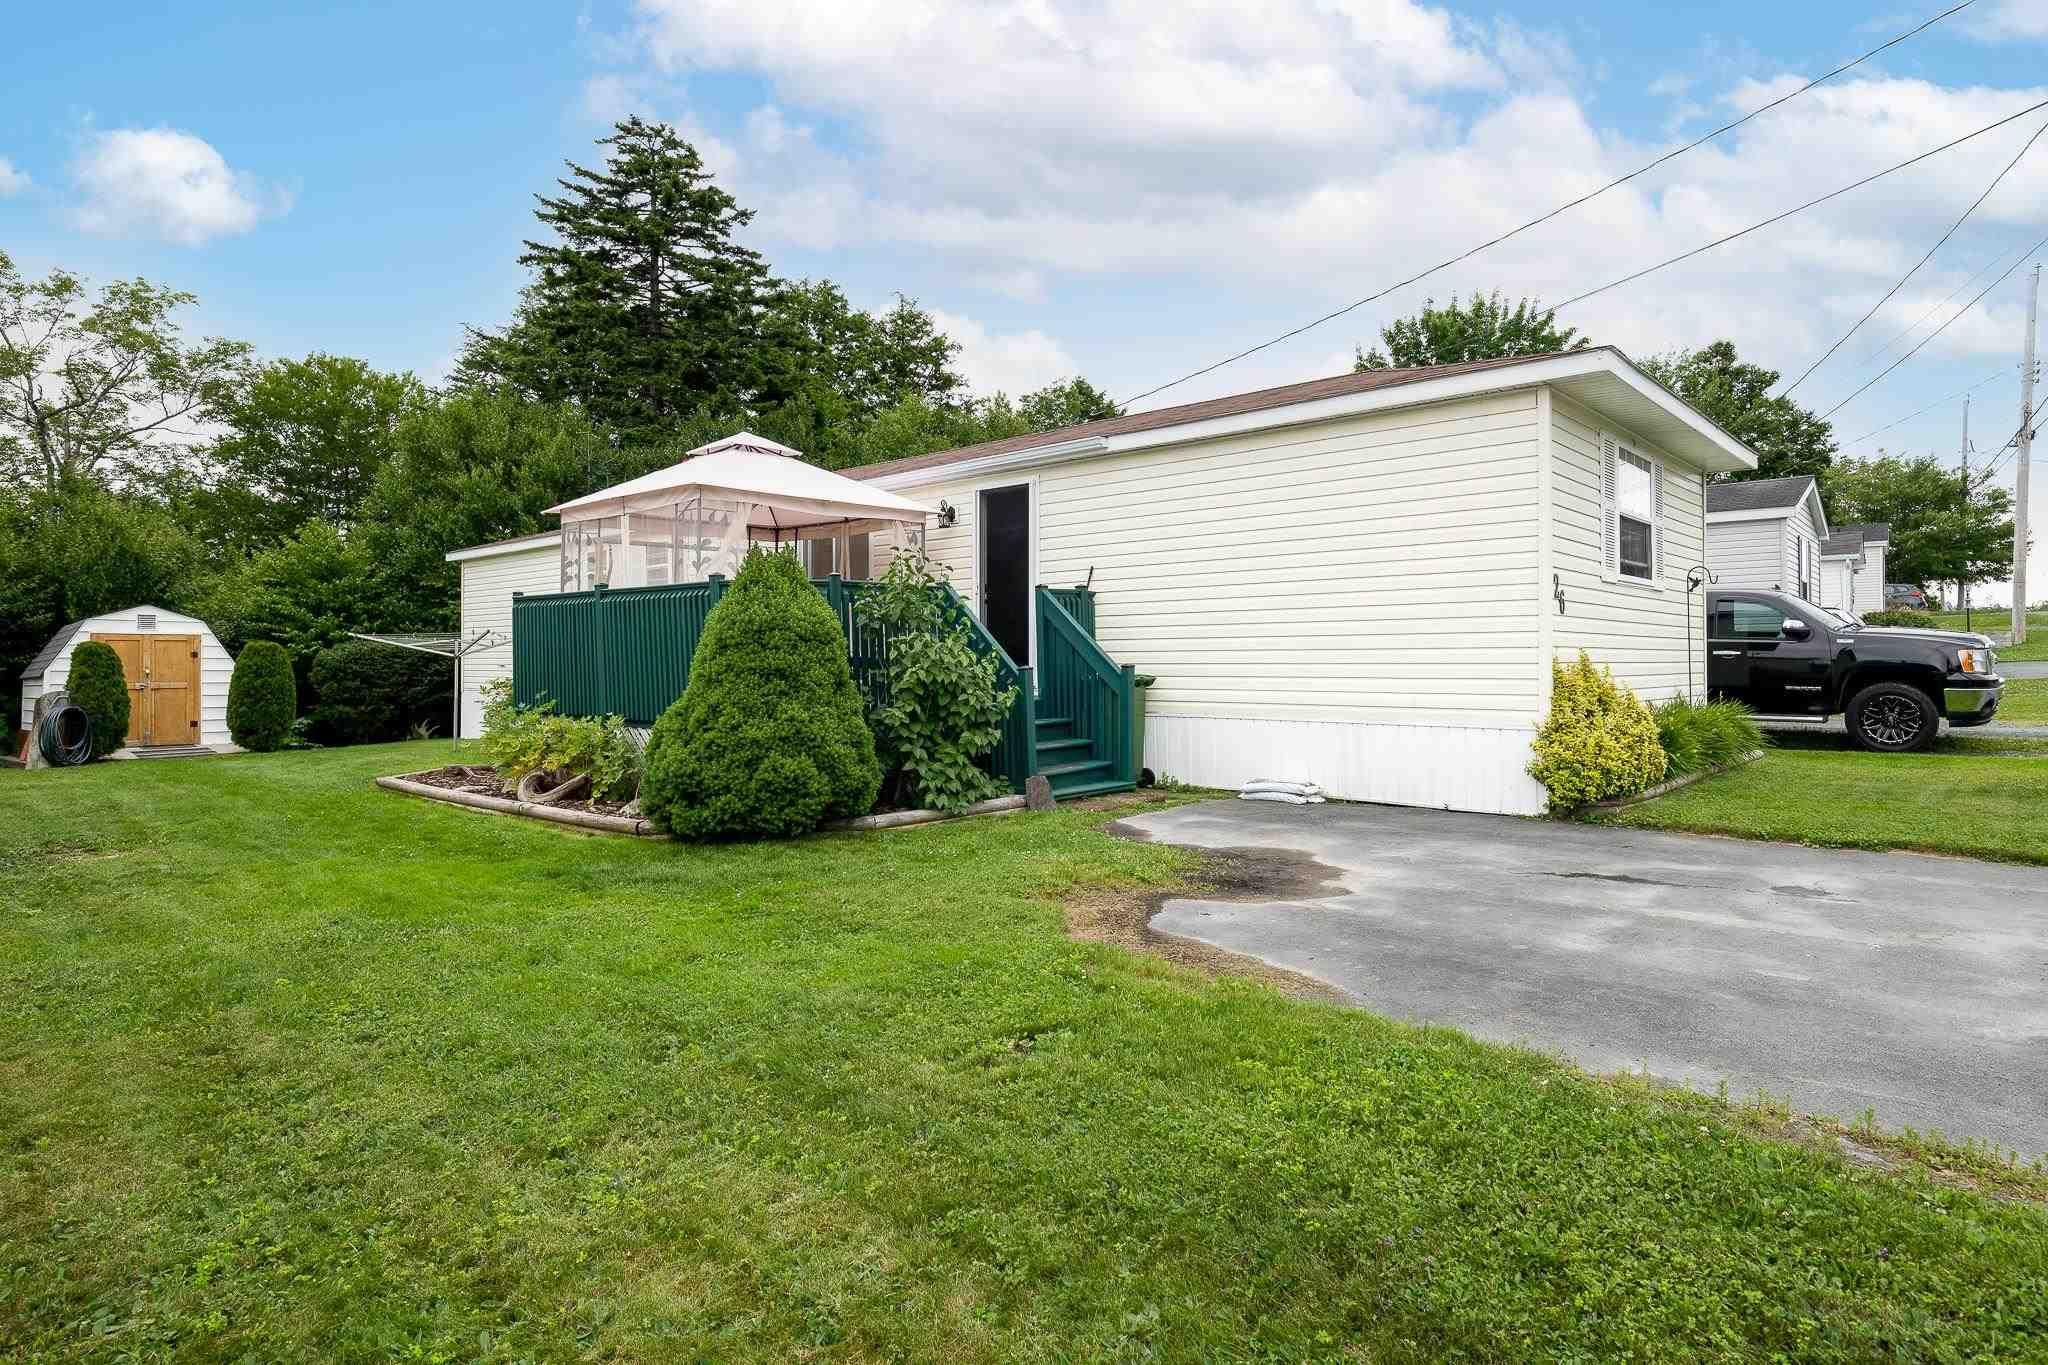 Main Photo: 26 Mountain View Drive in Lake Echo: 31-Lawrencetown, Lake Echo, Porters Lake Residential for sale (Halifax-Dartmouth)  : MLS®# 202118984